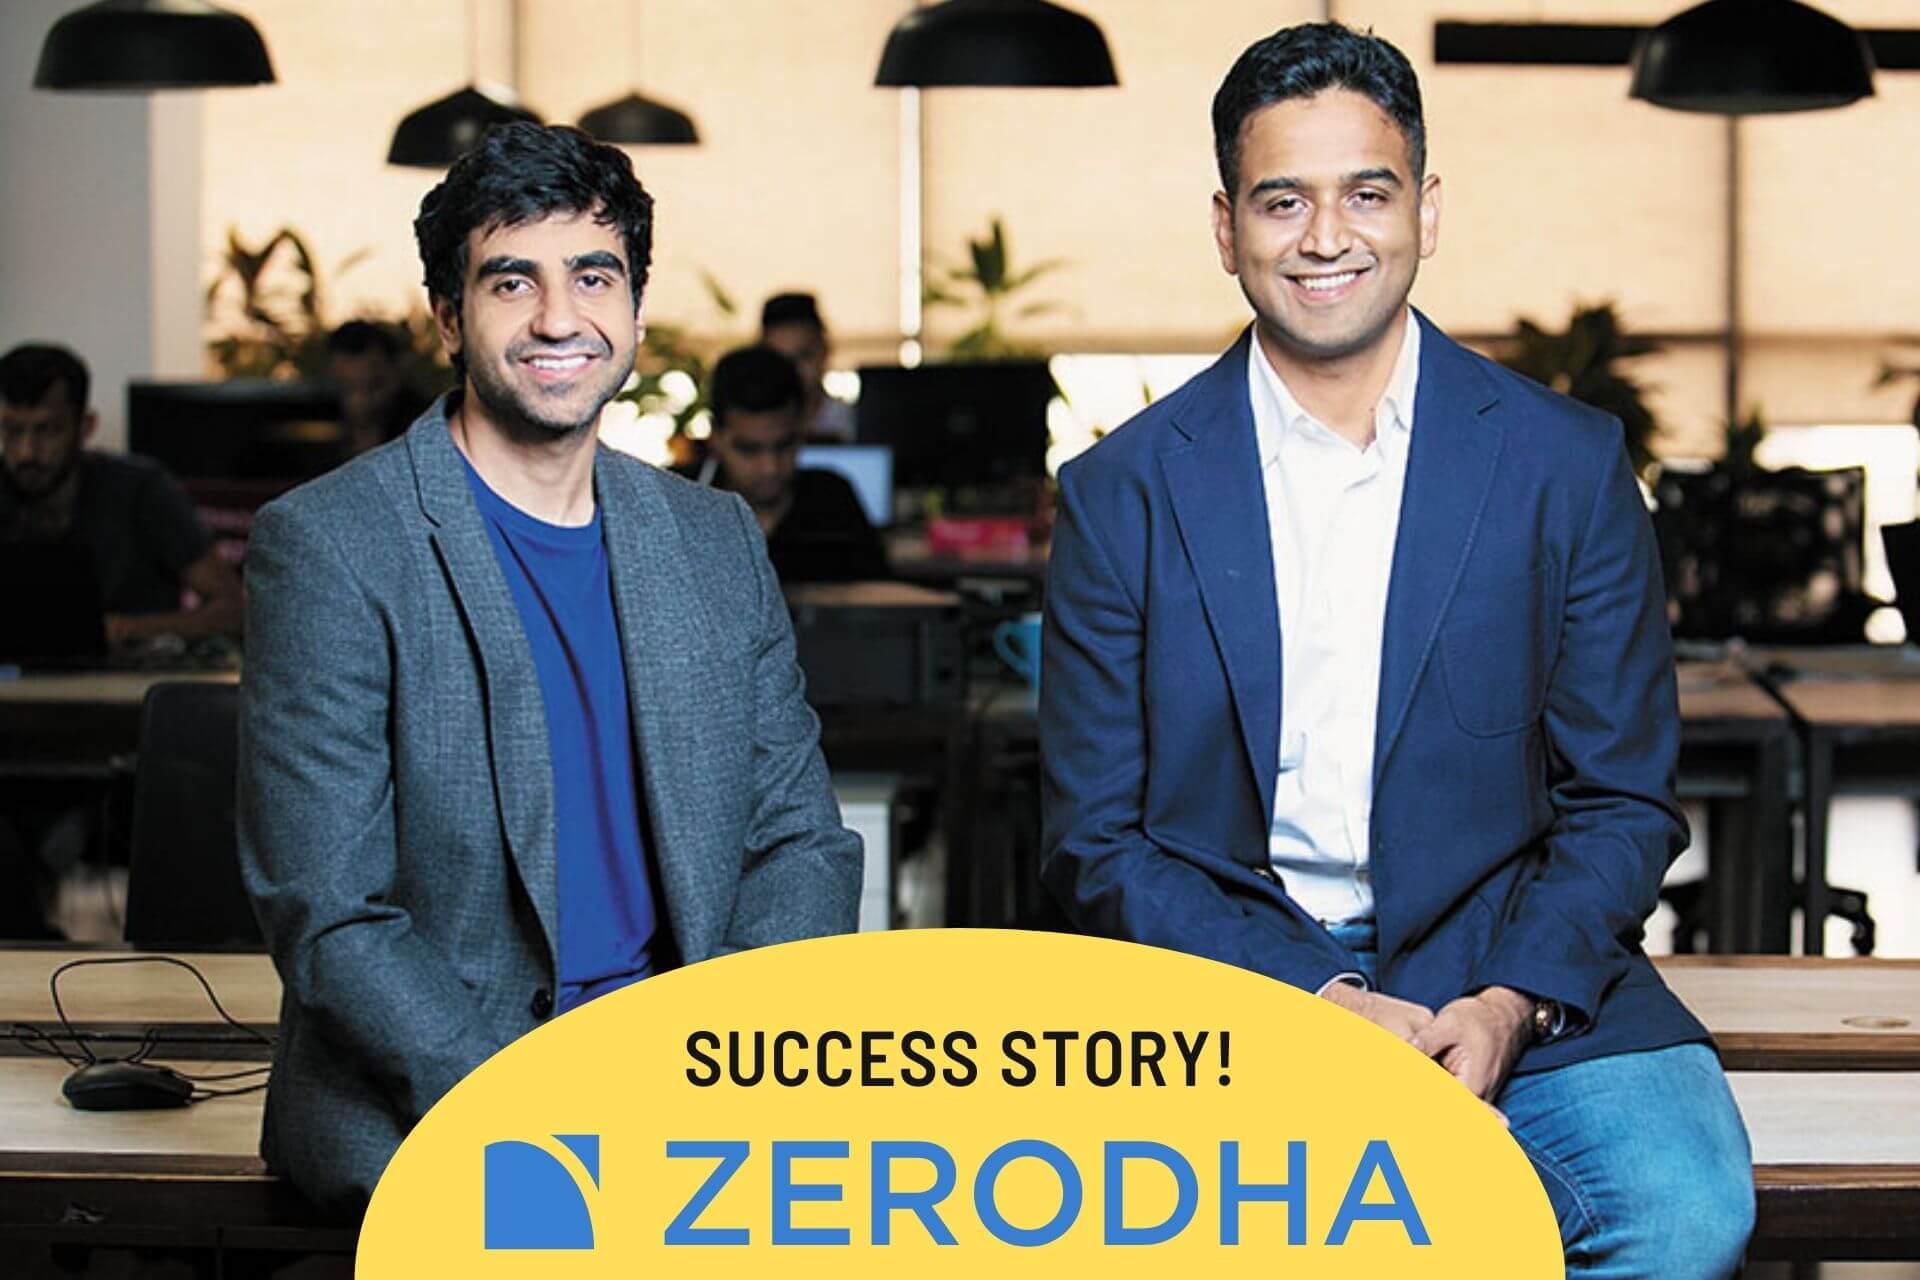 Zerodha Success Story: Journey to Biggest Stockbroking in India!